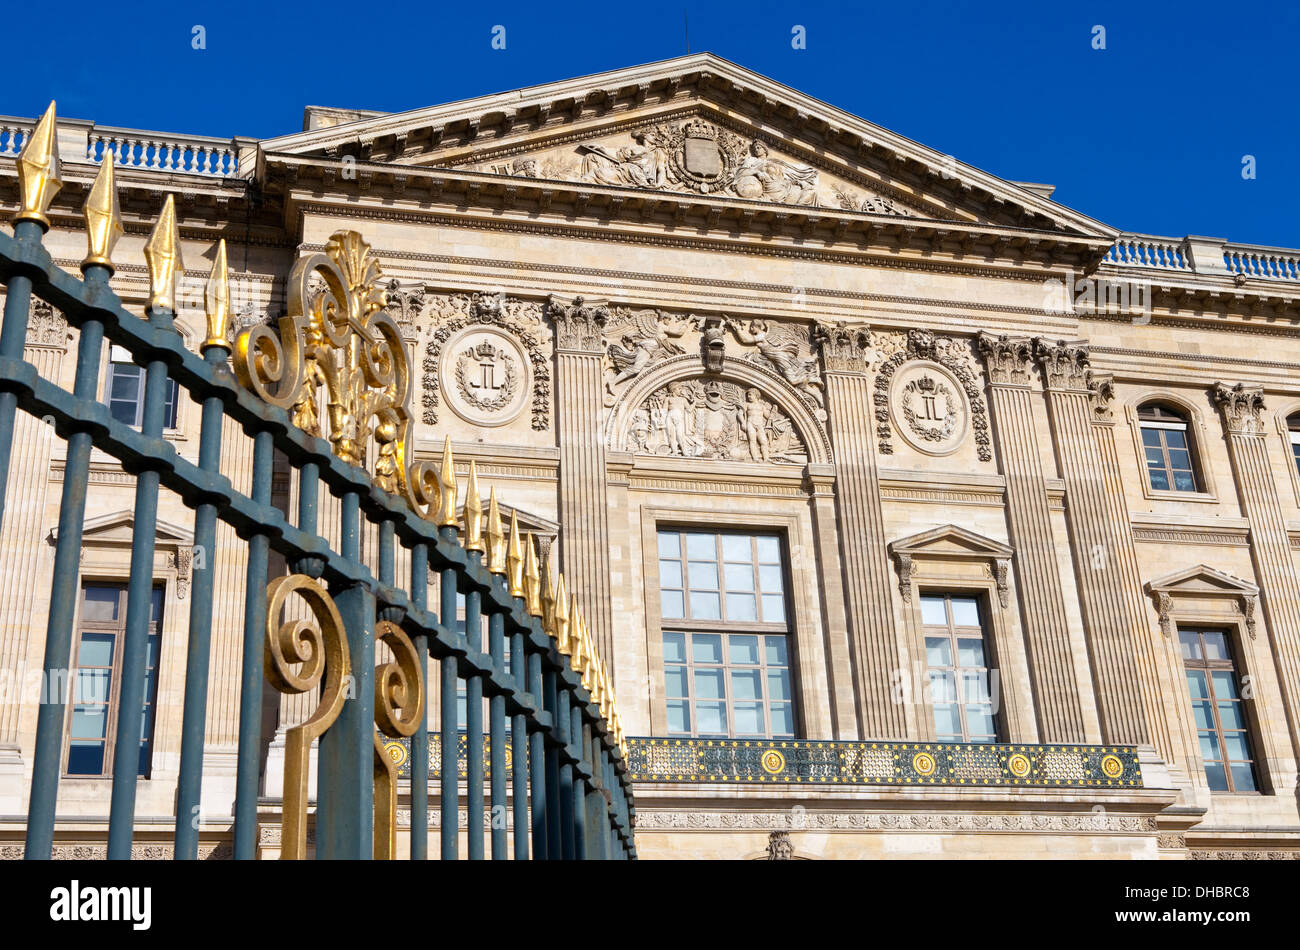 The Galerie d'Apollon in Paris, France - Stock Image